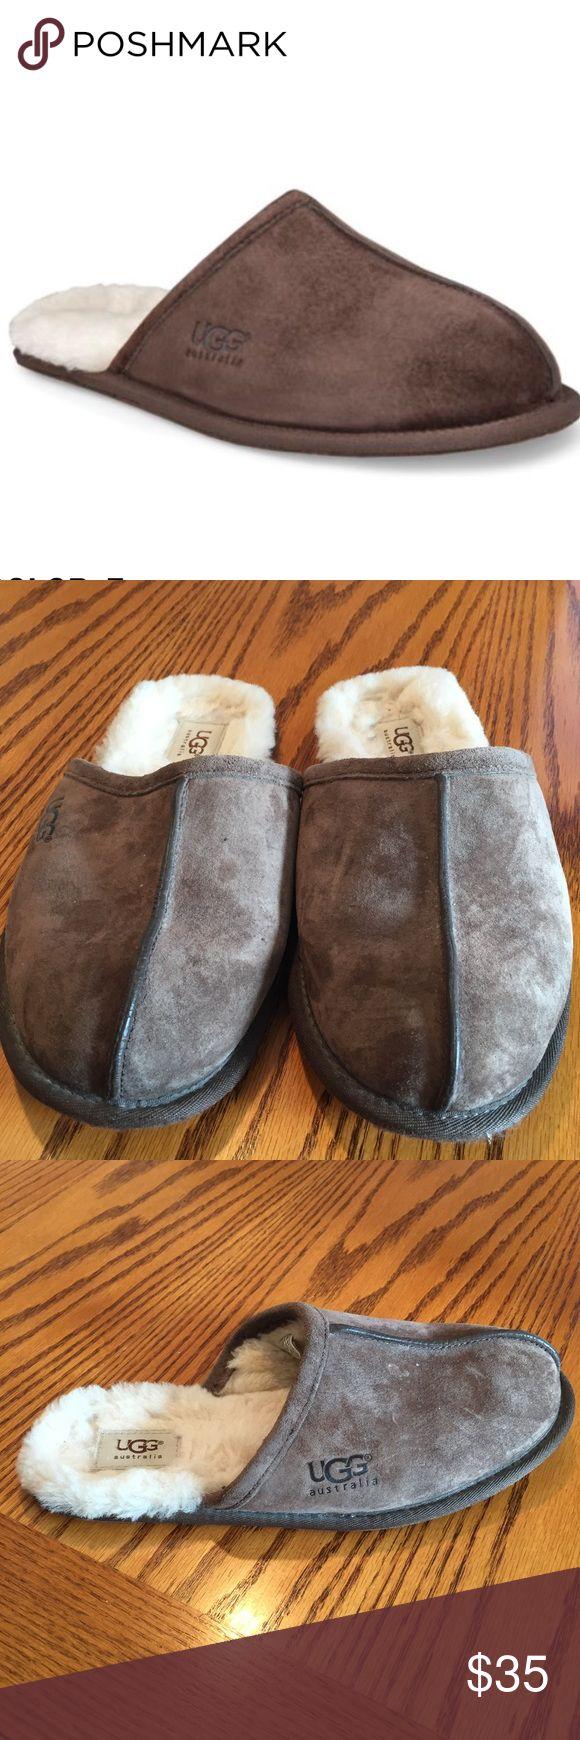 Ugg men's scuff slip on slippers Size 9 Ugg men's scuff slip on slippers in espresso. Size 9 UGG Shoes Loafers & Slip-Ons